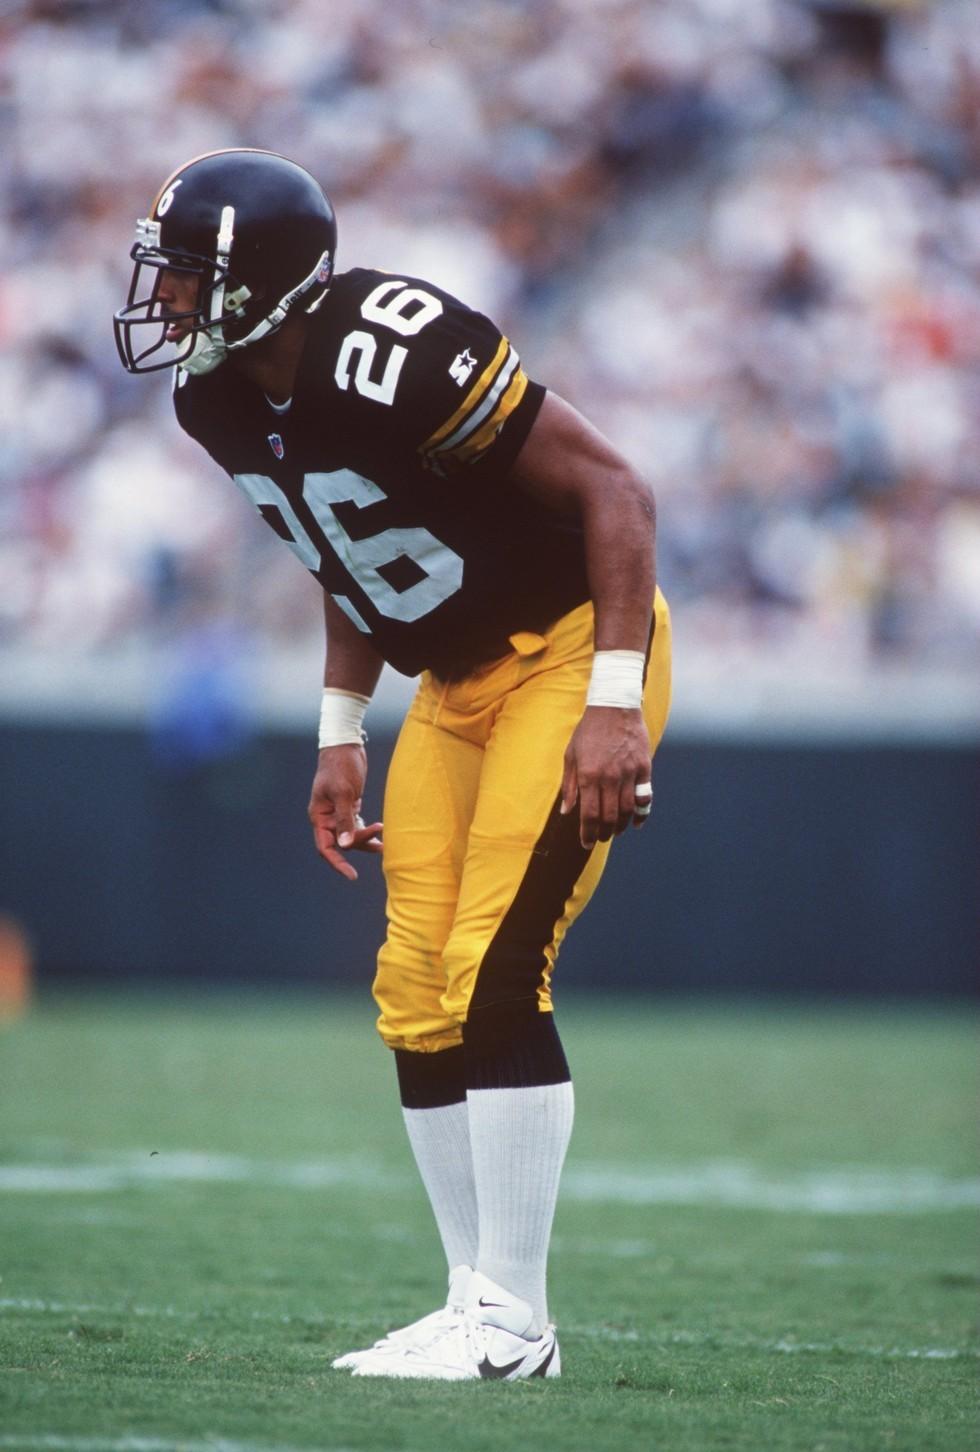 No. 3 Rod Woodson (Steelers)